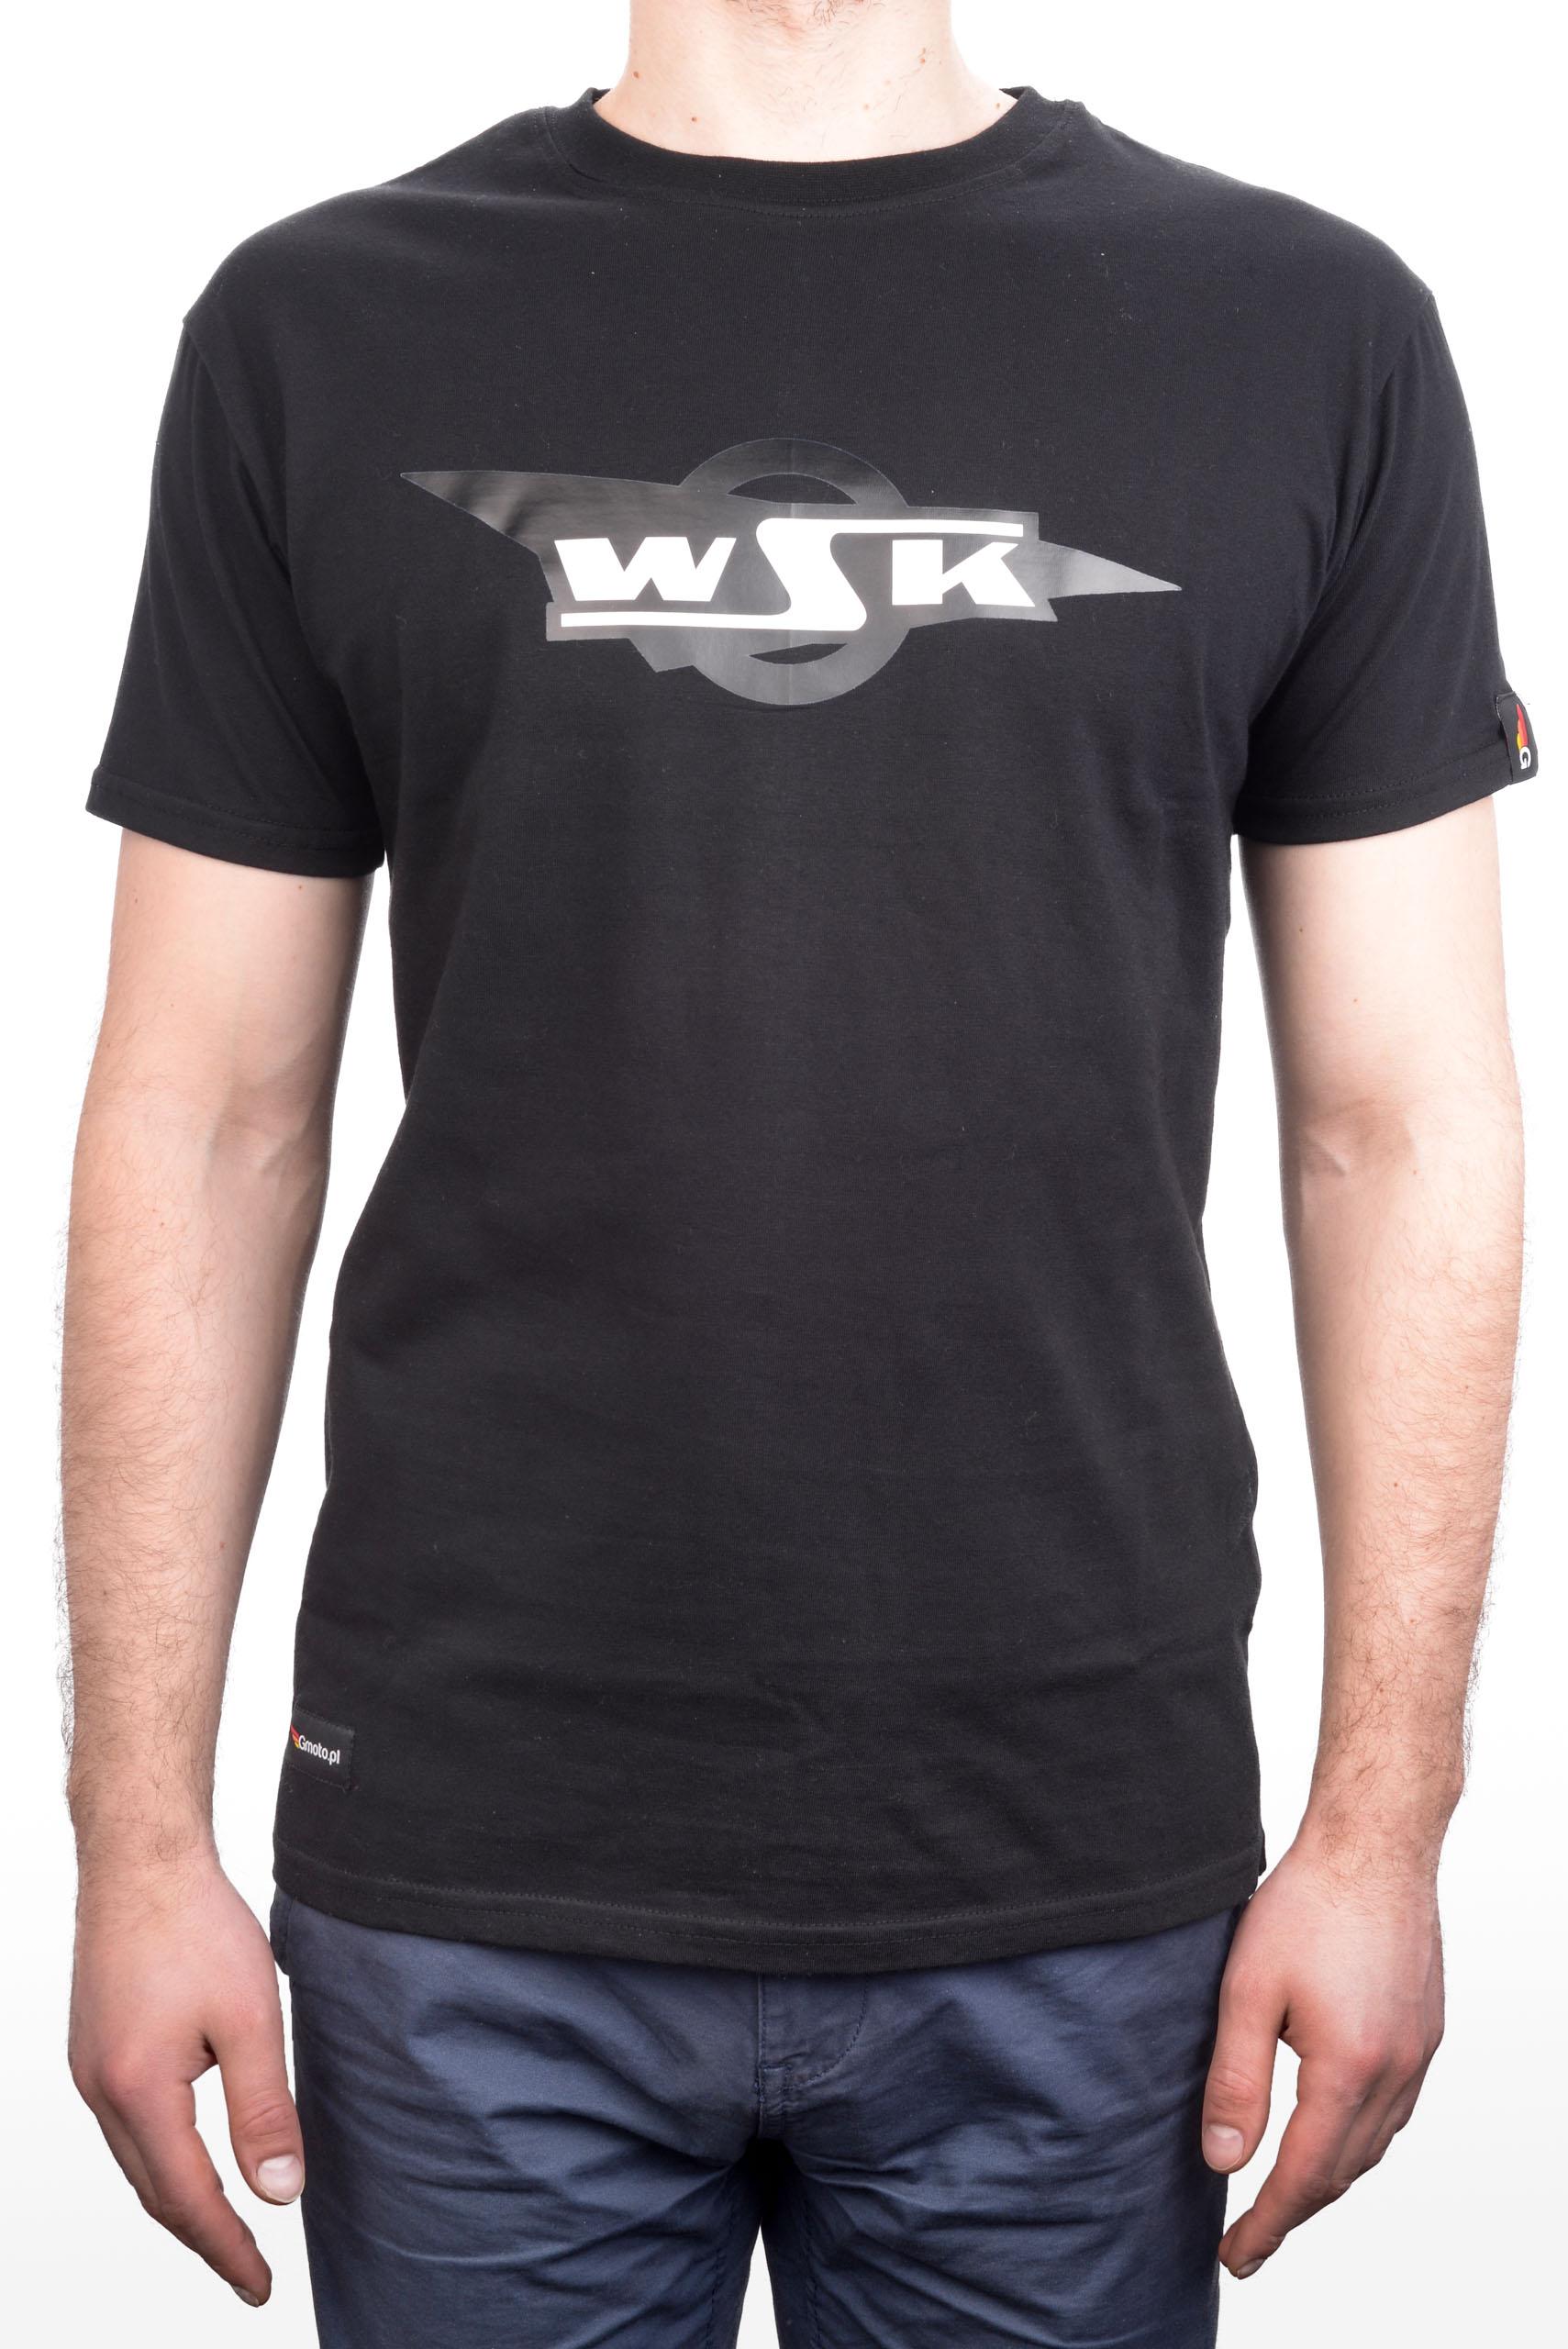 KOSZULKA T-shirt MOTOCYKLOWA WSK 125 175 L